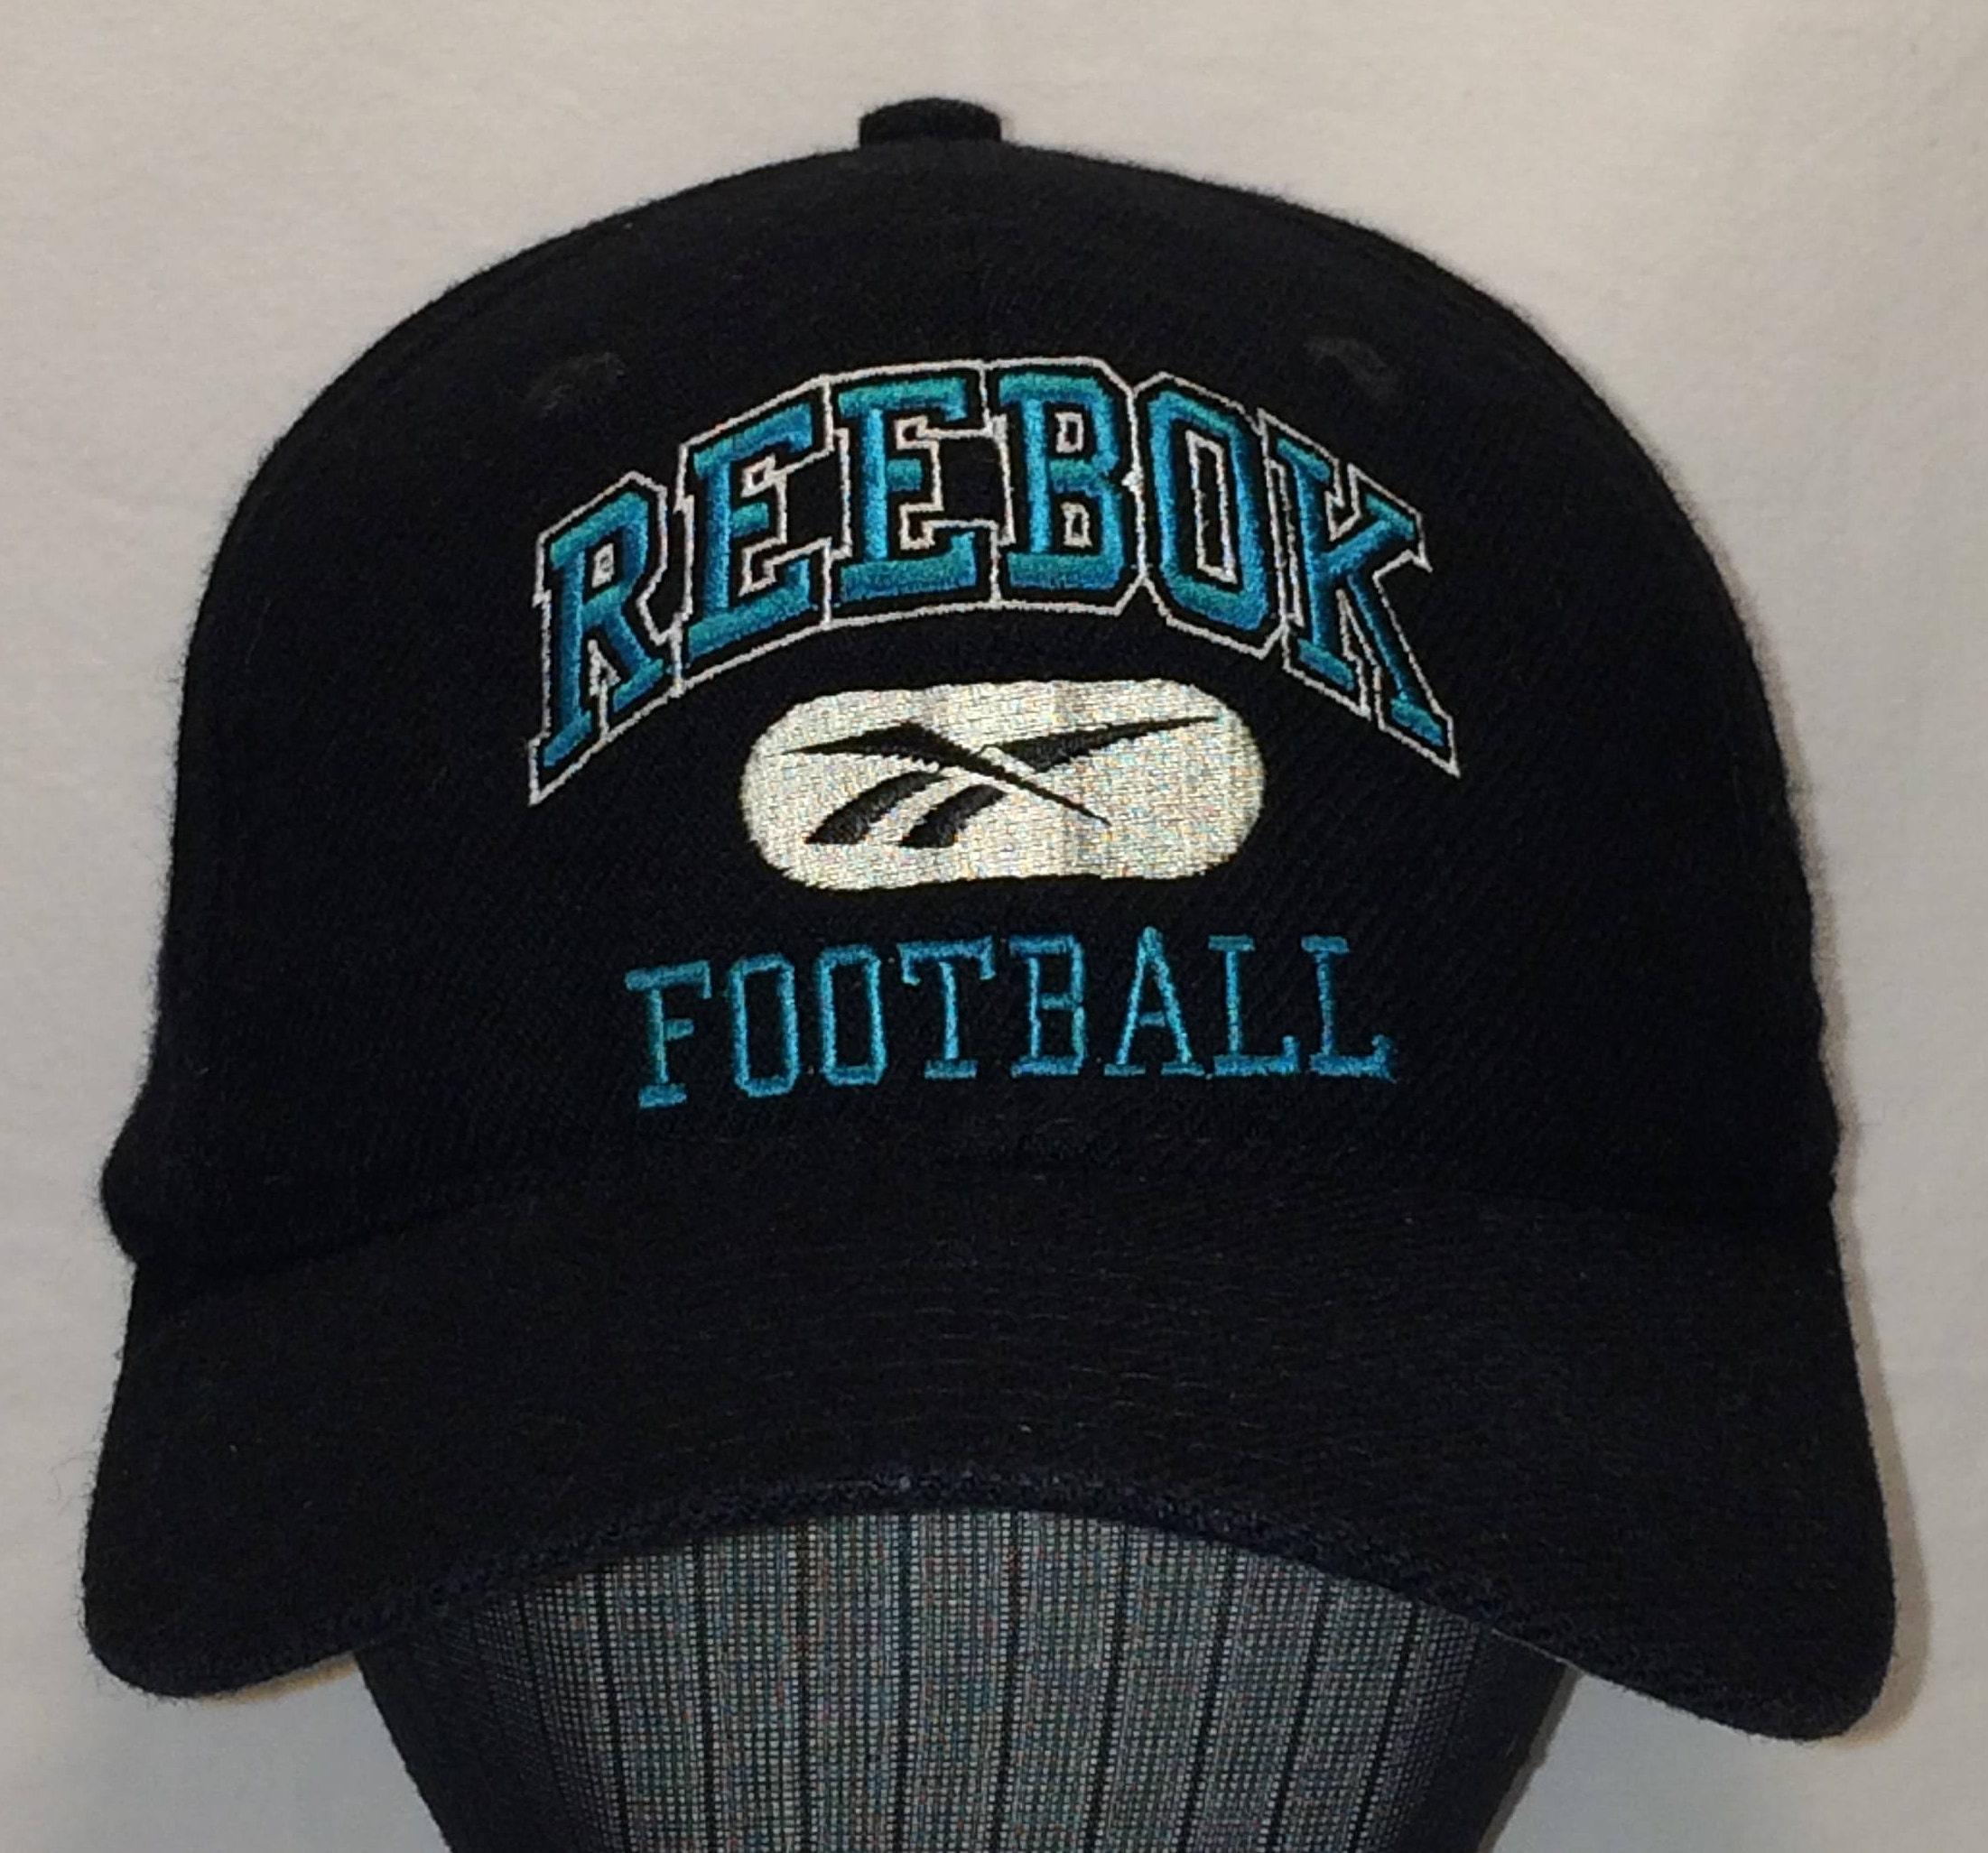 low priced 85821 718a4 ... nfl gabbro 47 mvp cap td80ei7313 a0a5f 9832b  low cost vintage reebok  football snapback hat blackblue gridiron hats save up to 80 196eb 117e9